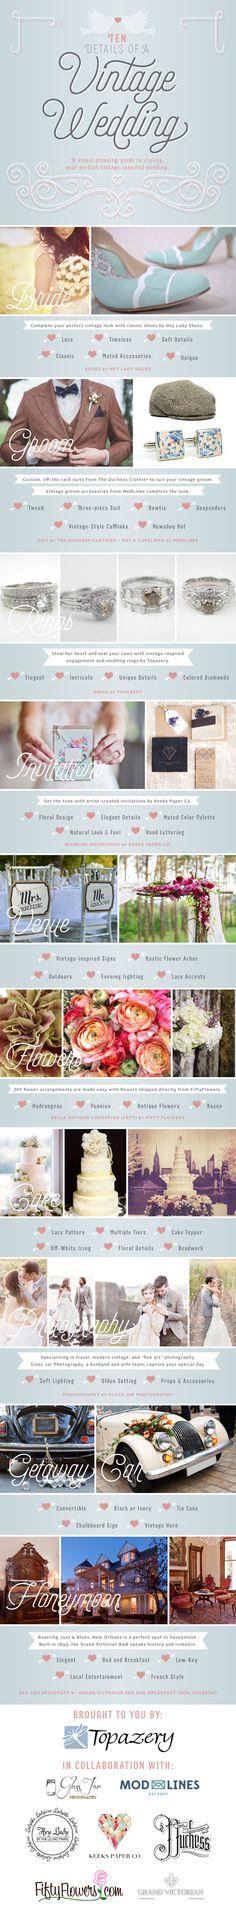 Ten Details of a Vintage #Wedding   Topazery http://www.topazery.com/antique-jewelry-blog-entry/Ten-Details-of-a-Vintage-Wedding/